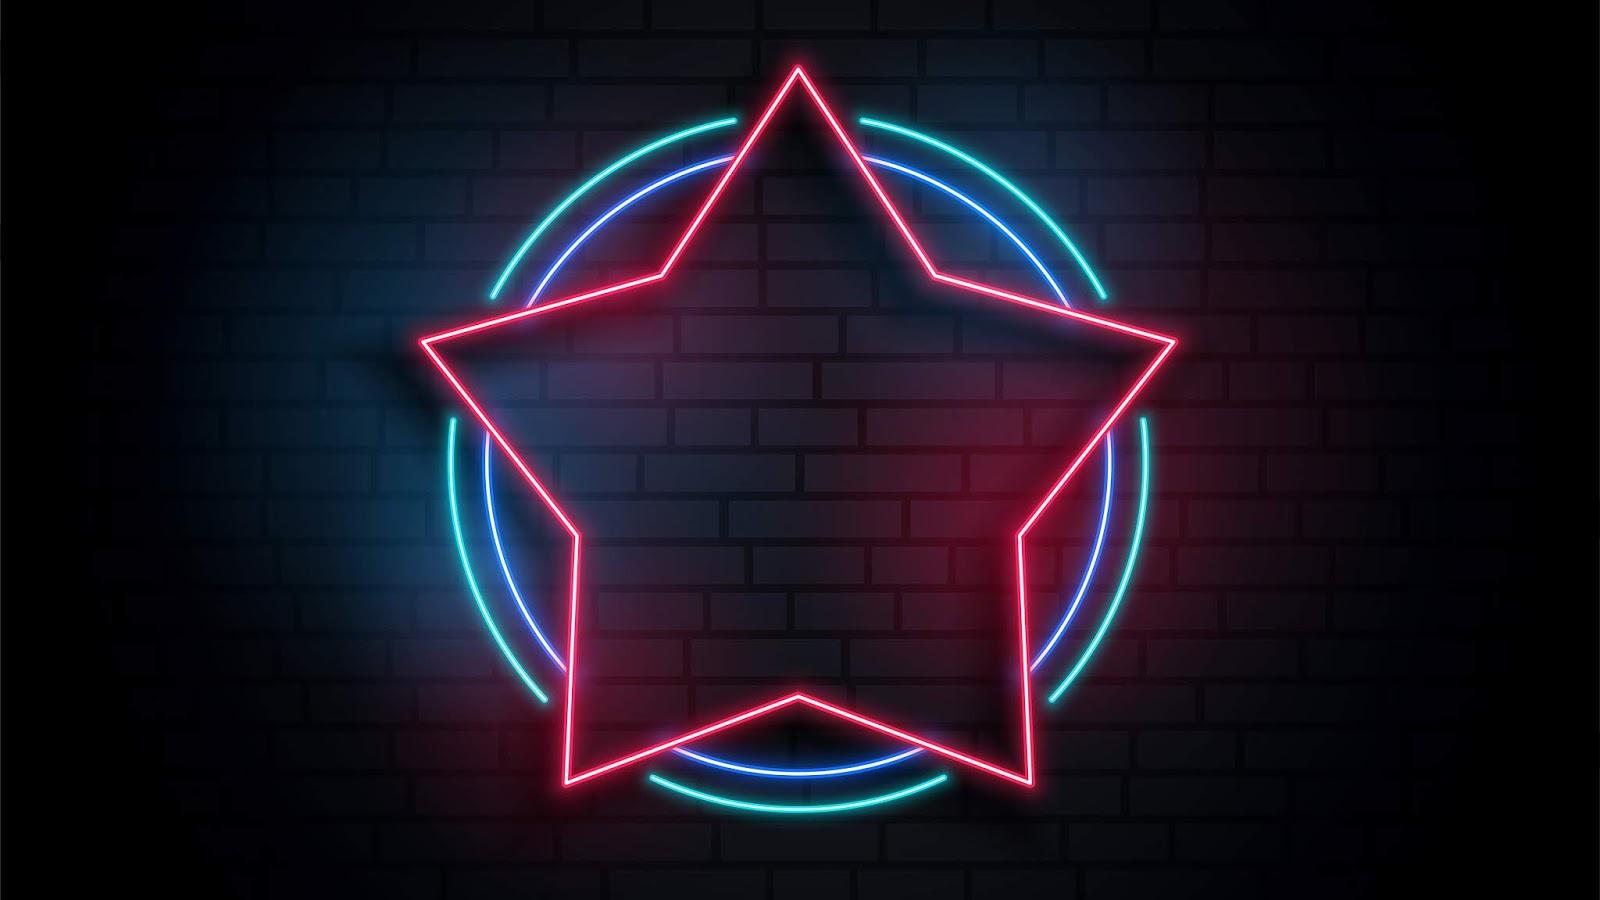 Neon star 4k wallpaper 2160x3840 pixels